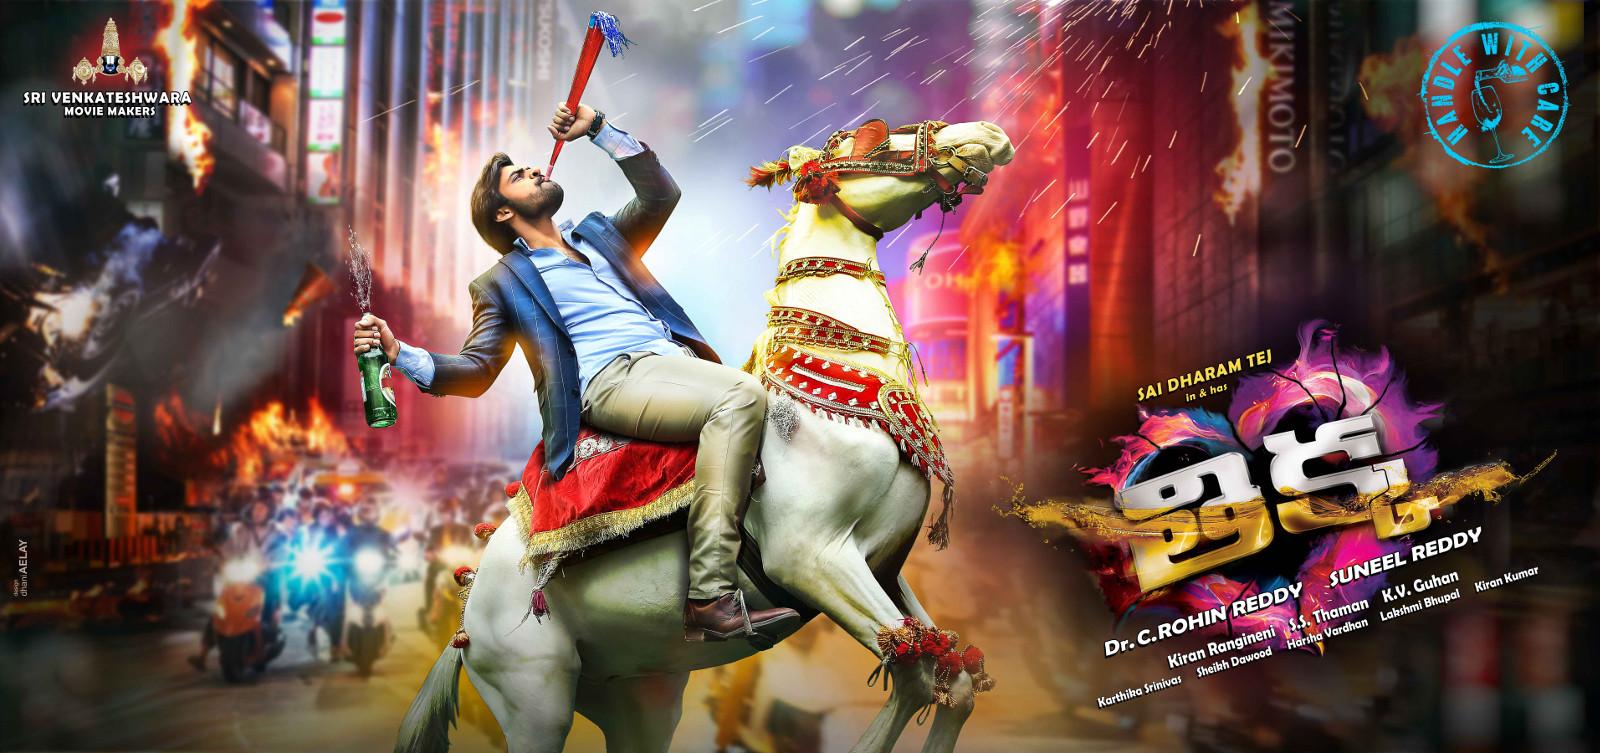 Sai Dharam Tej's Thikka Movie First Look Wallpaper